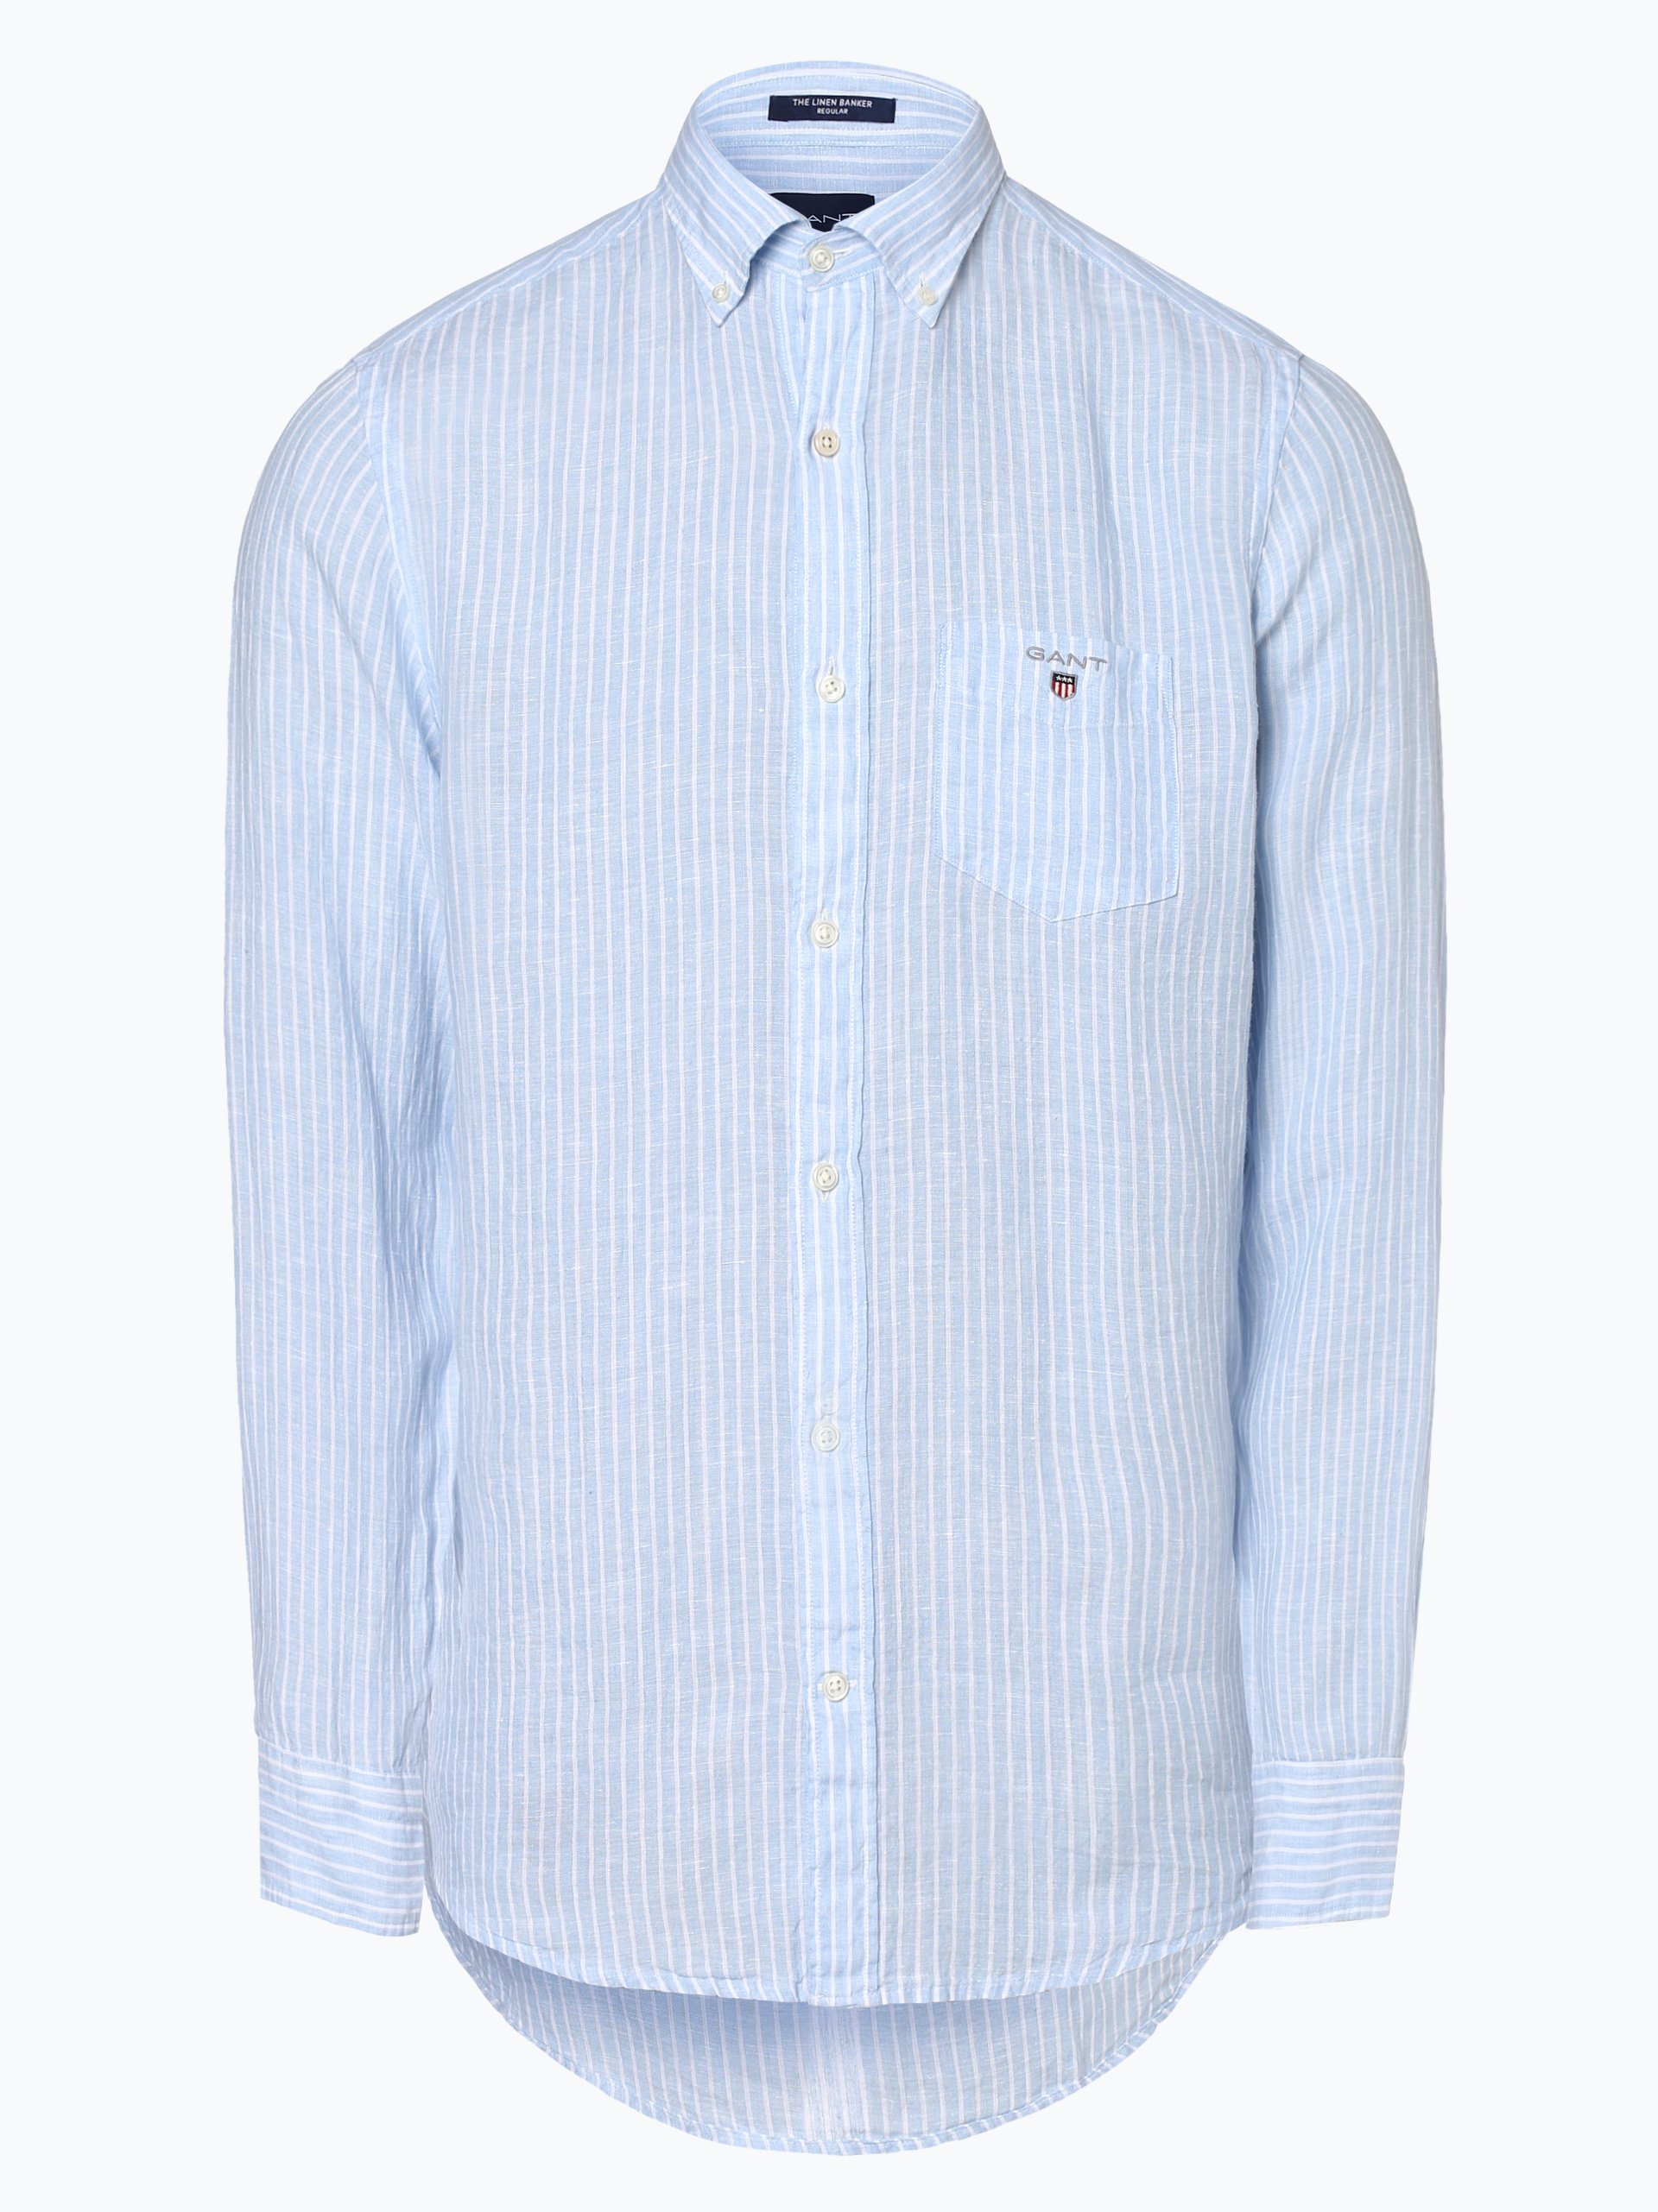 Gant Męska koszula lniana